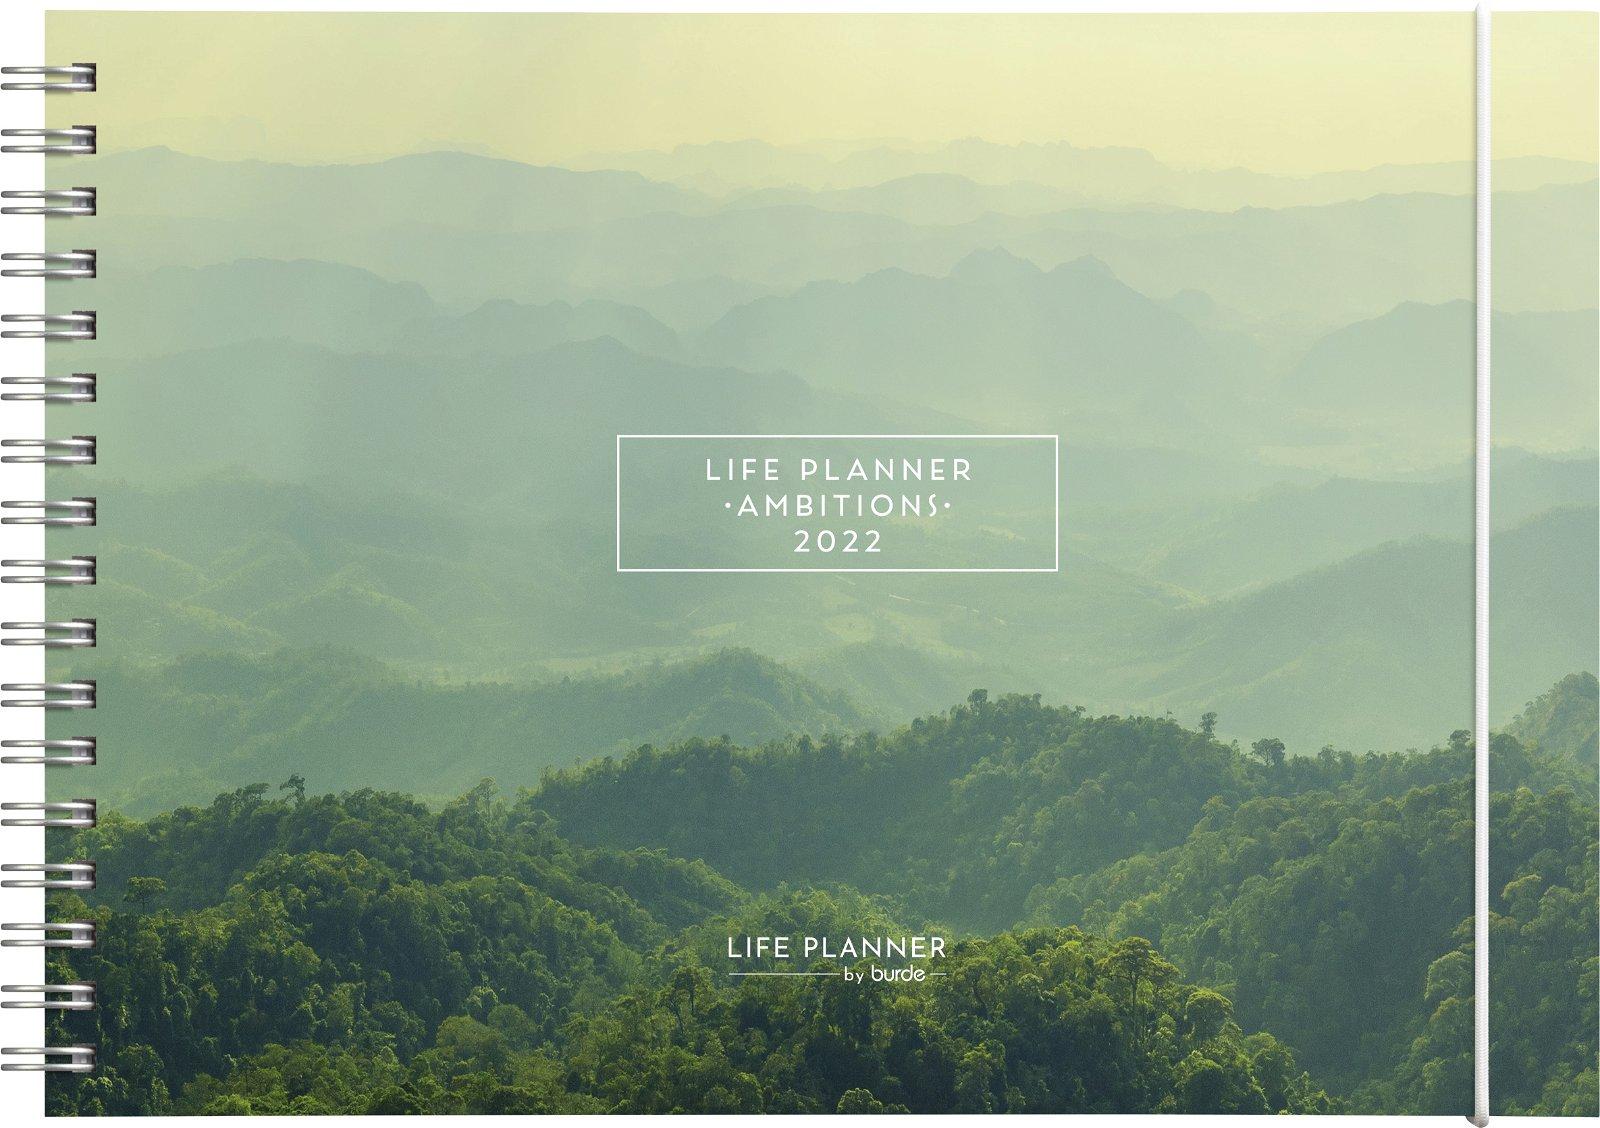 Burde Life Planner Ambitions  2022